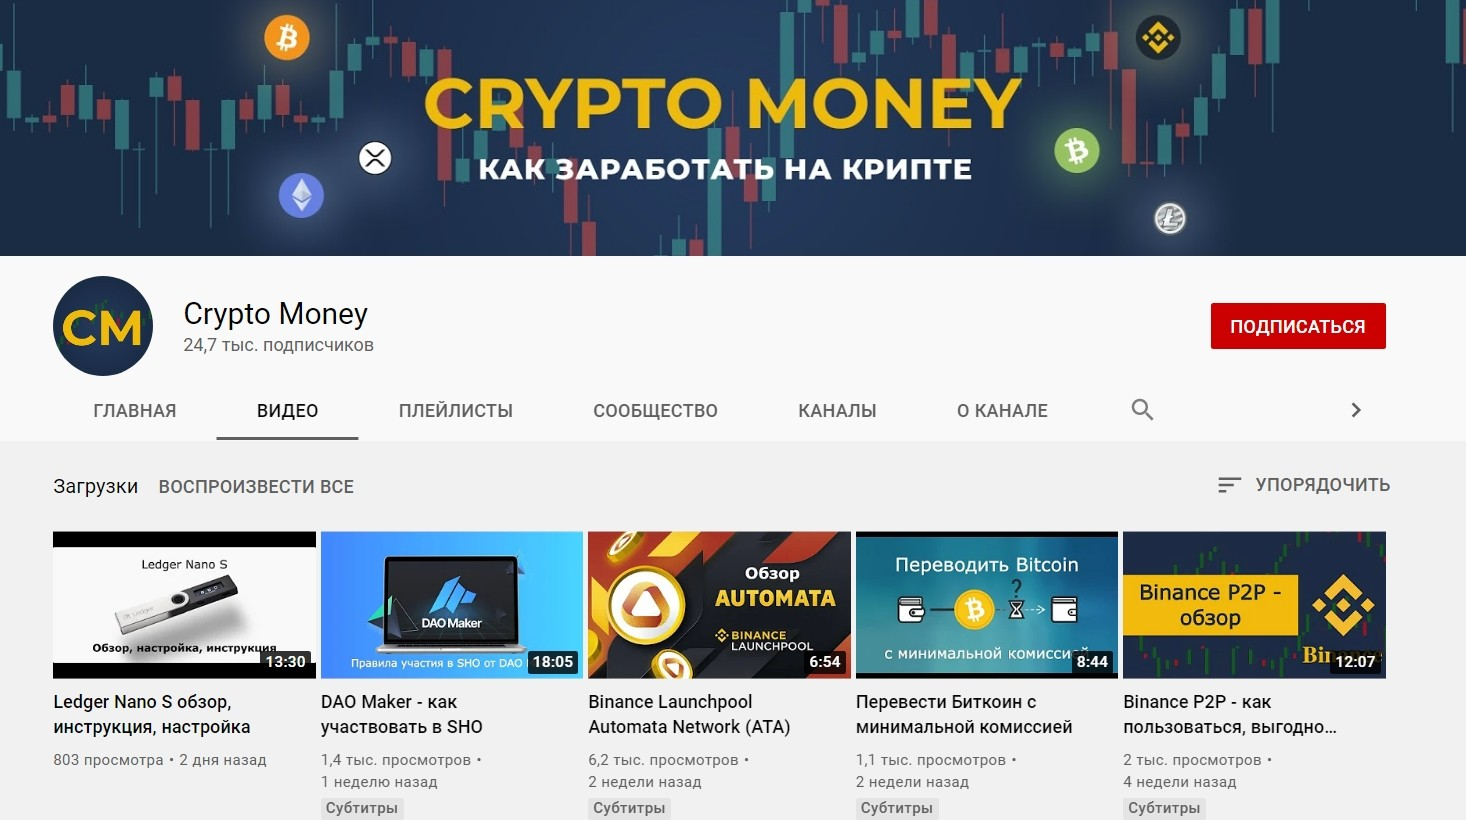 Ютуб канал Crypto Money Сергея Княжевича